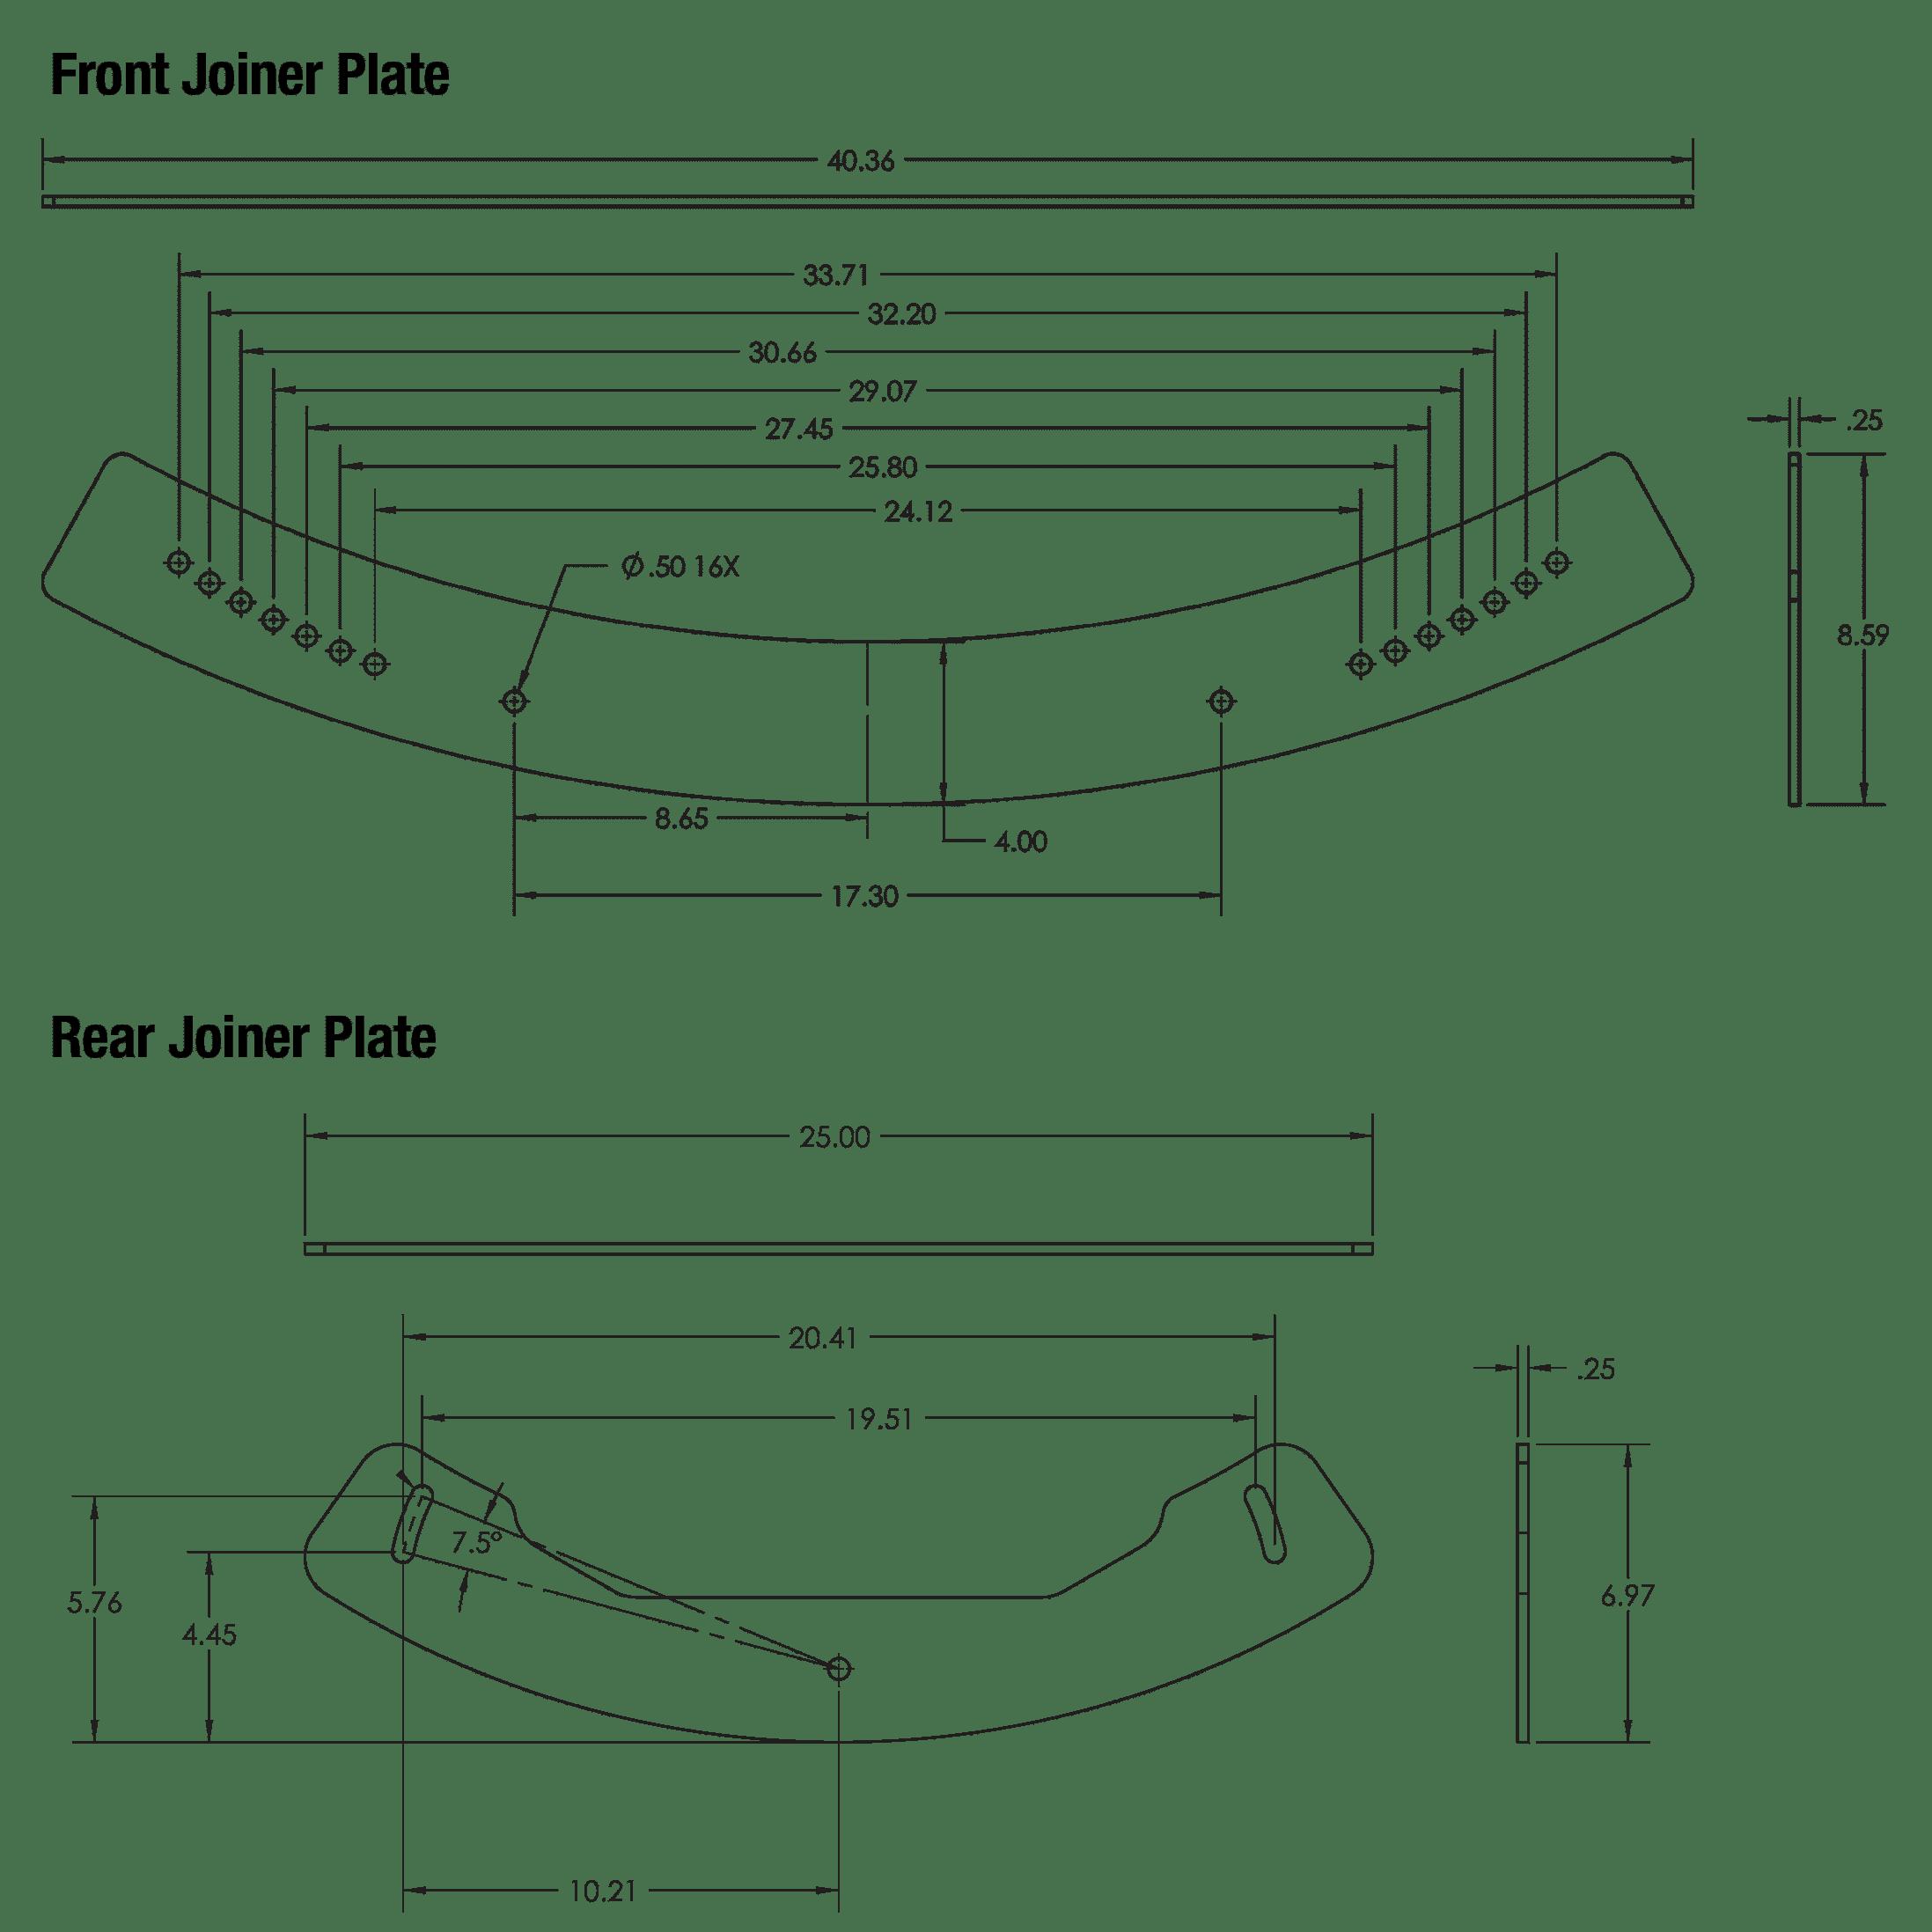 fp-am7315-3x1-drawing